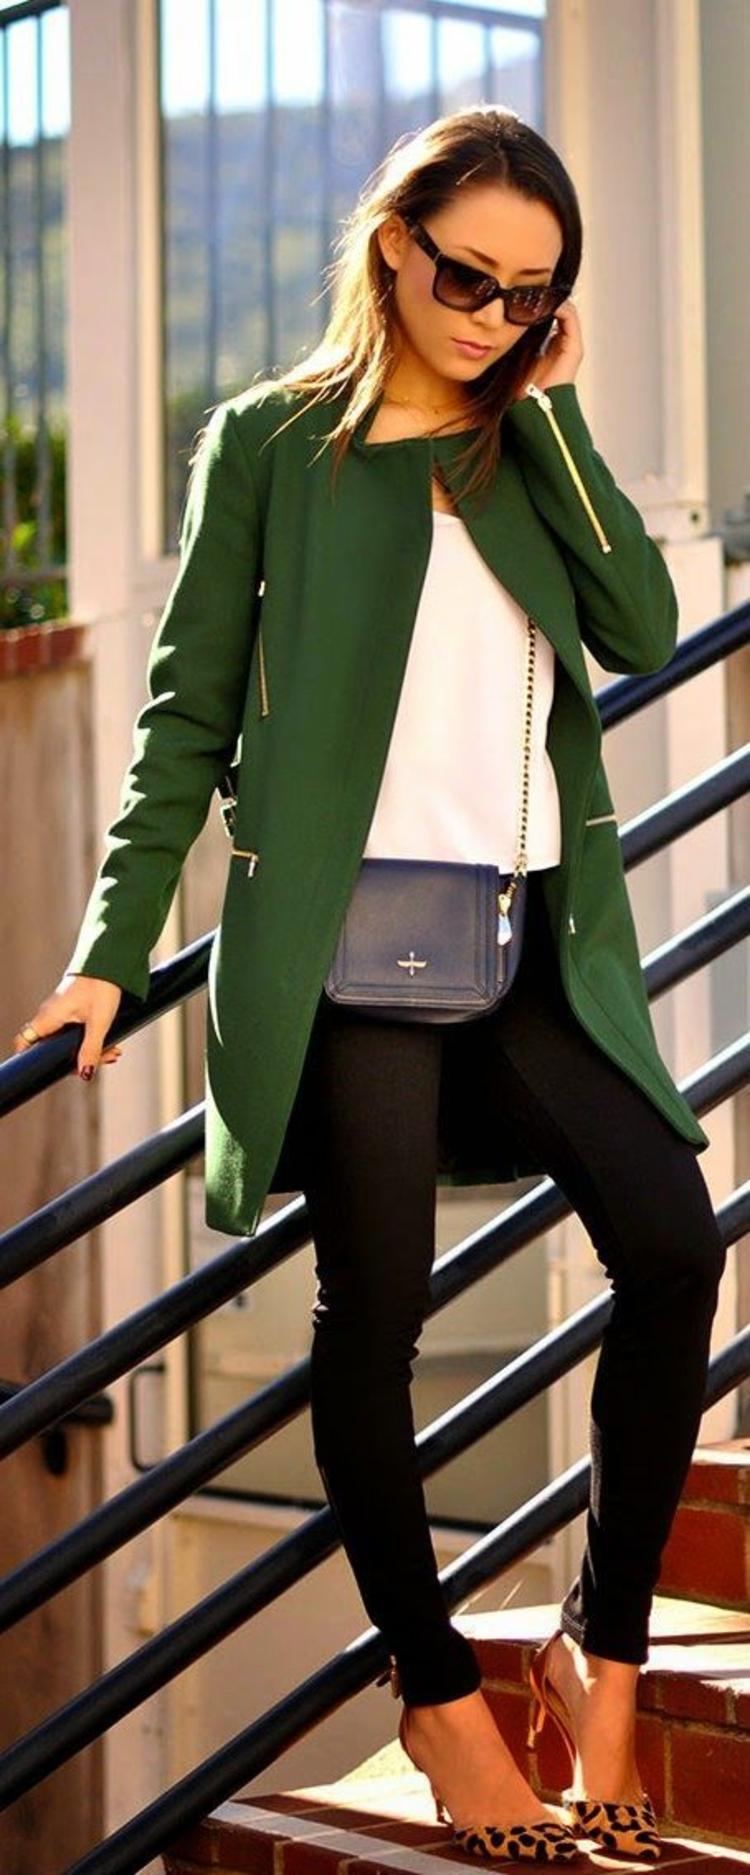 moderne Damenmäntel aktuelle Trendfarben Grün